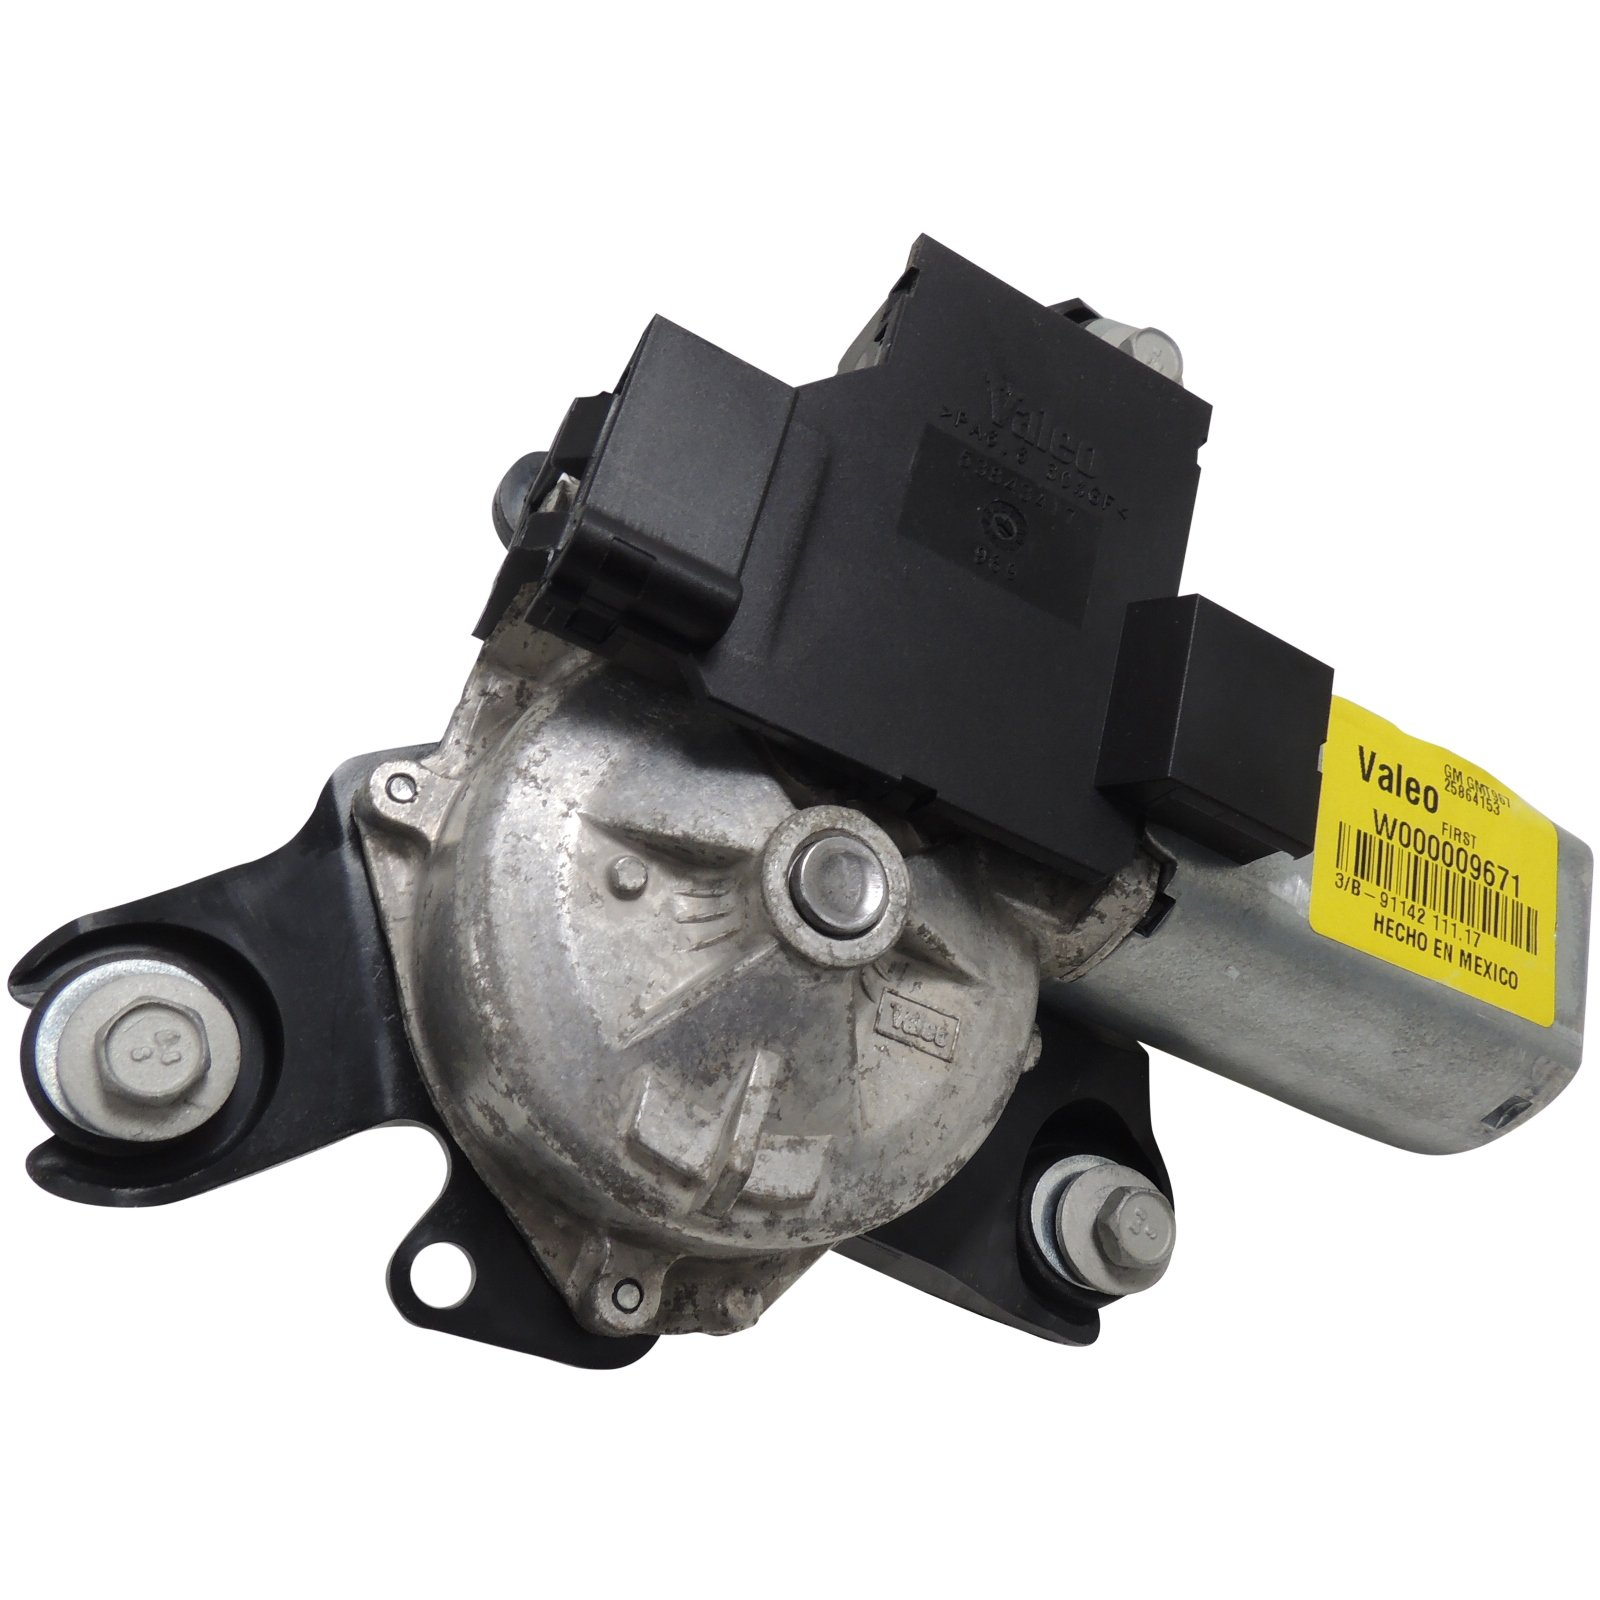 ACDelco 25864153 GM Original Equipment Rear Window Wiper Motor